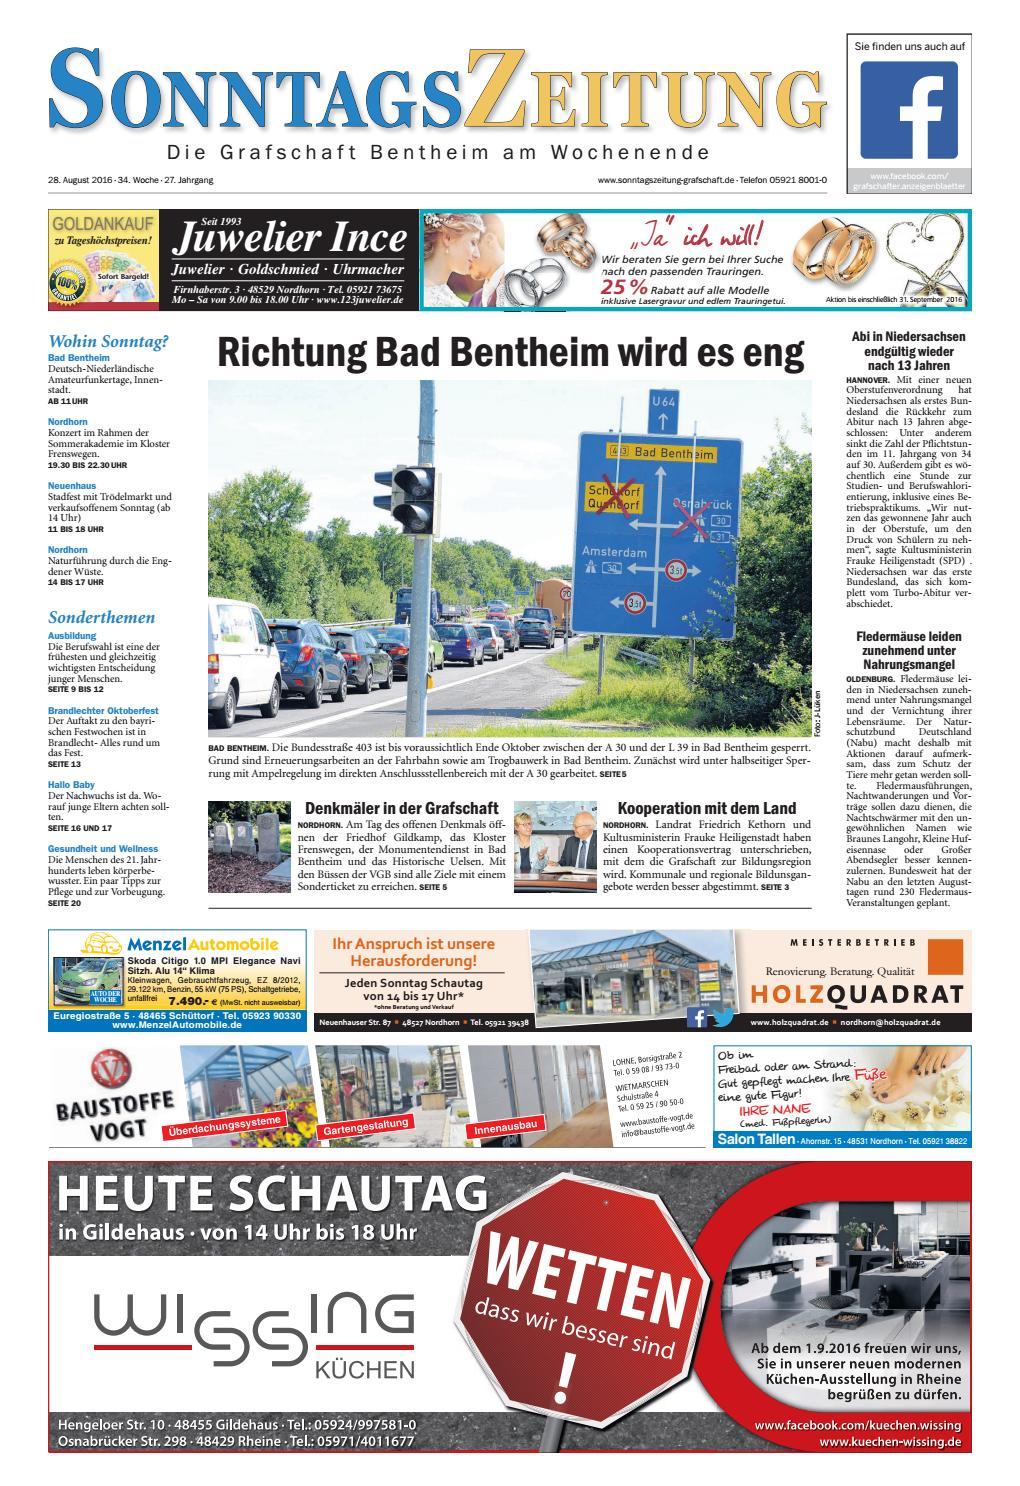 SonntagsZeitung_28-08-2016 by SonntagsZeitung - issuu